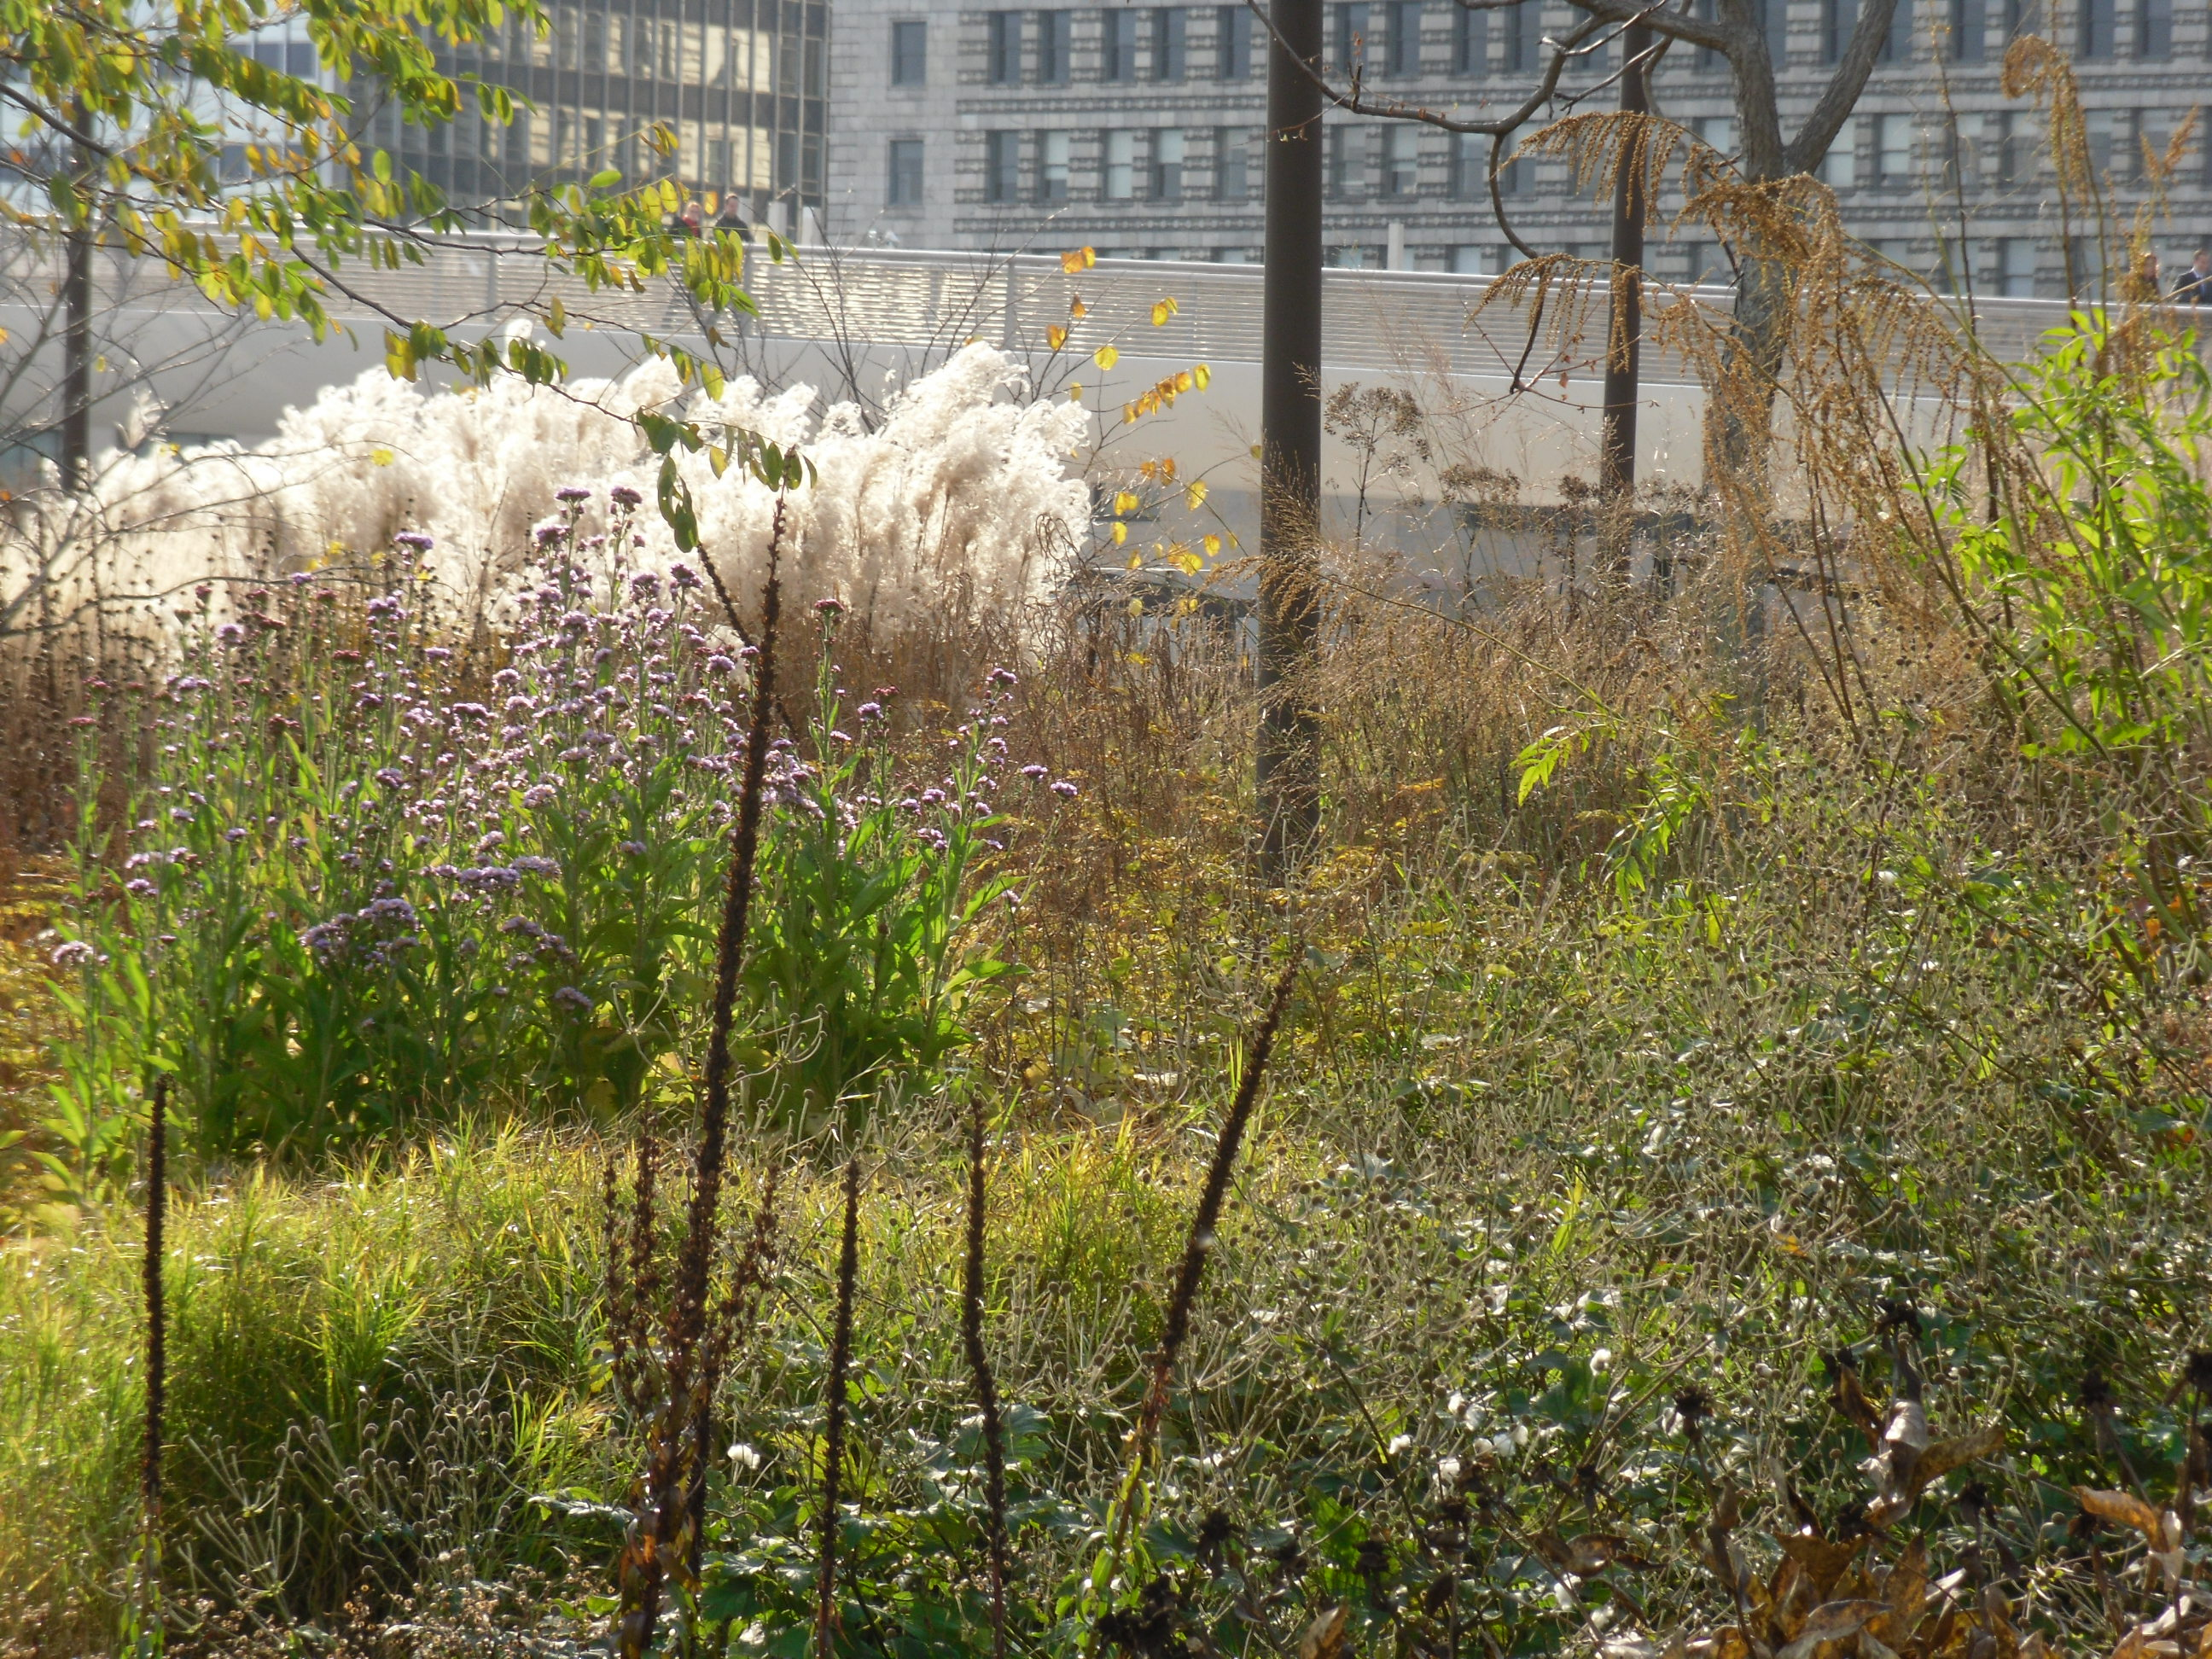 Piet oudolf plantstudios for Piet oudolf fall winter spring summer fall